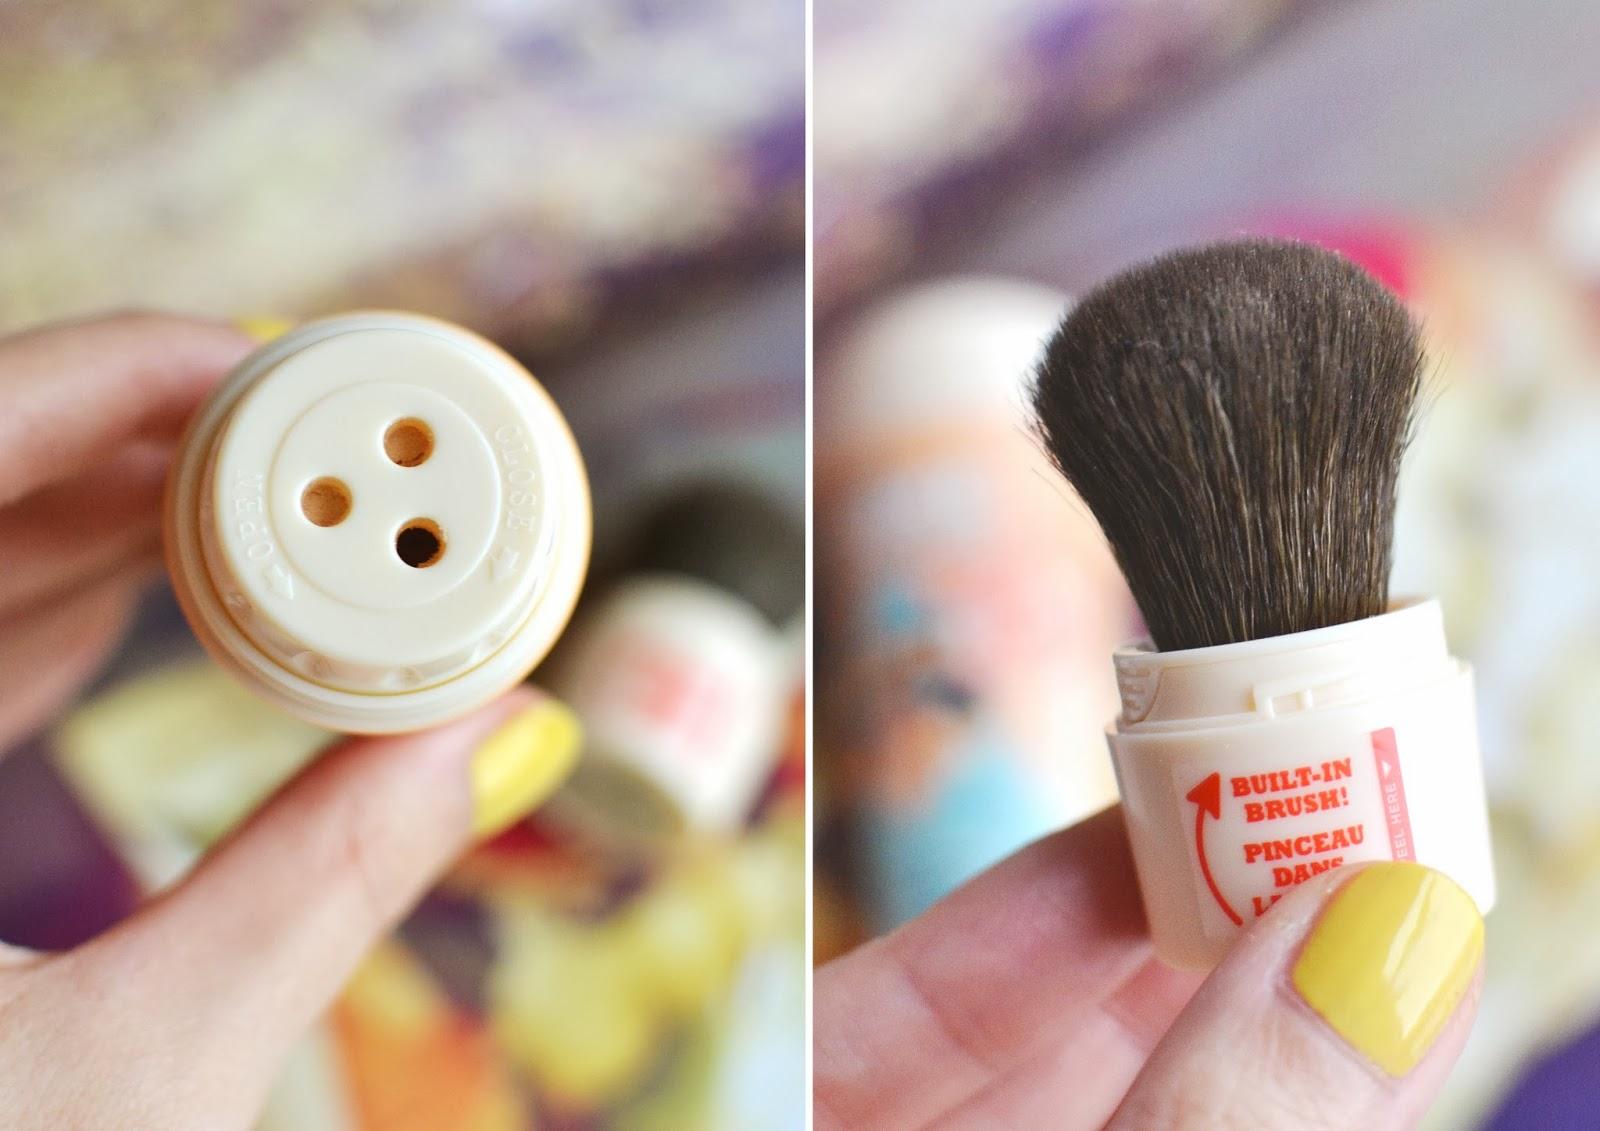 Anti-shine control powder, the best shine control powder